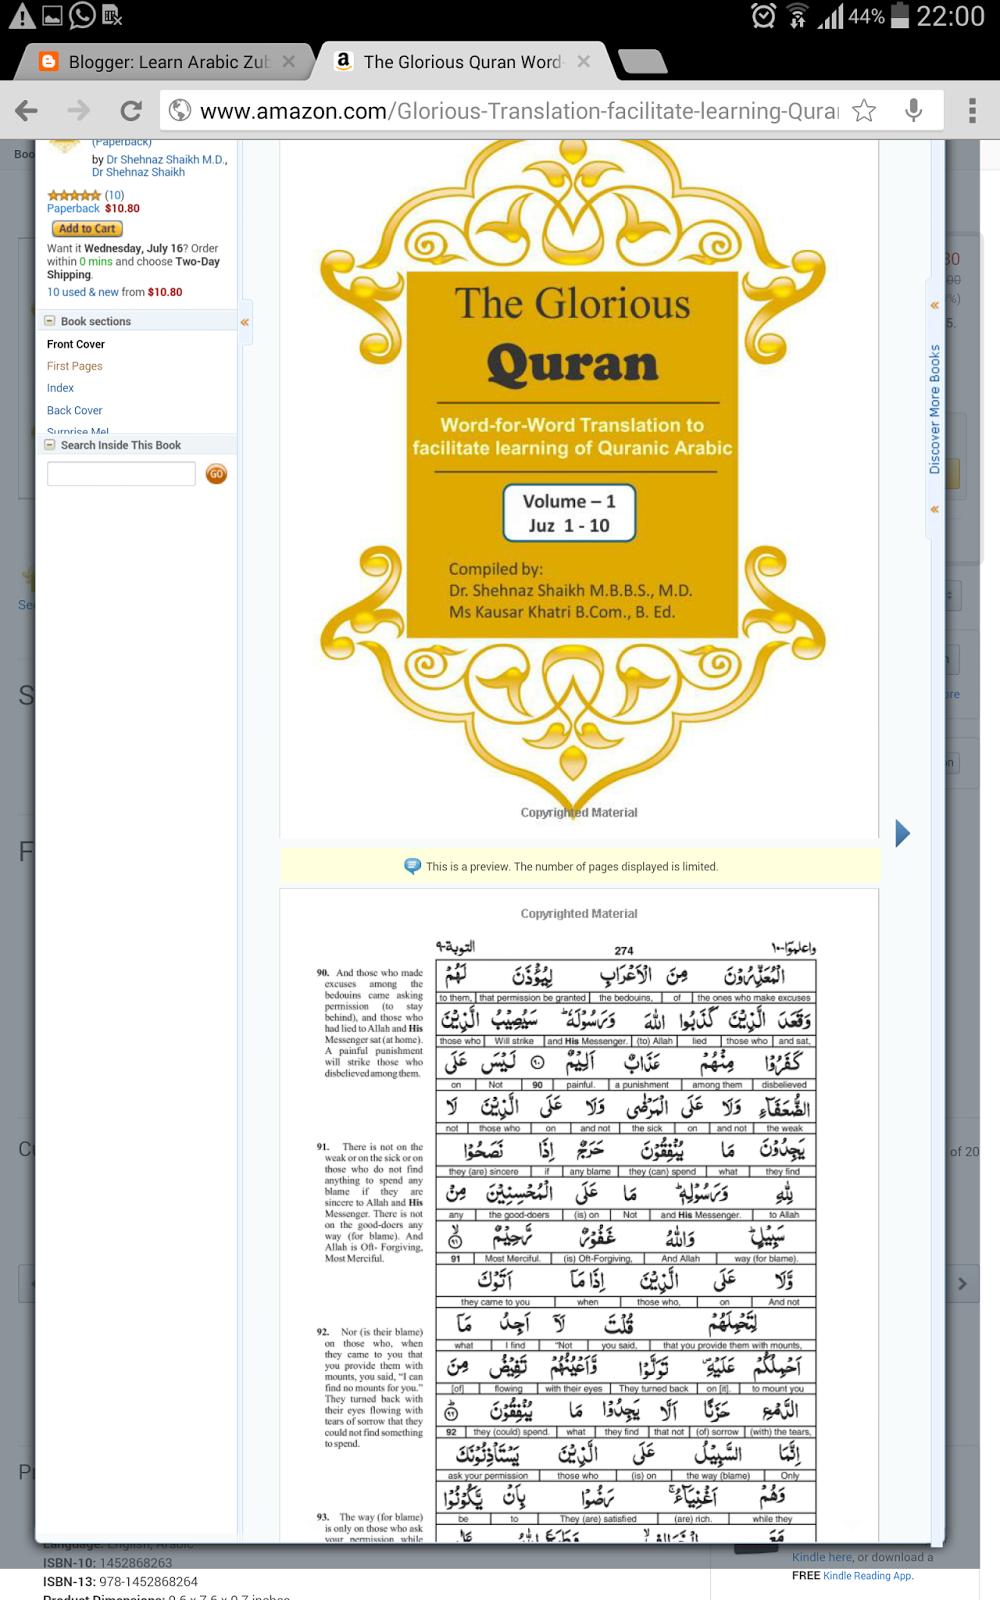 Learn Arabic Zuban (Language): 2014